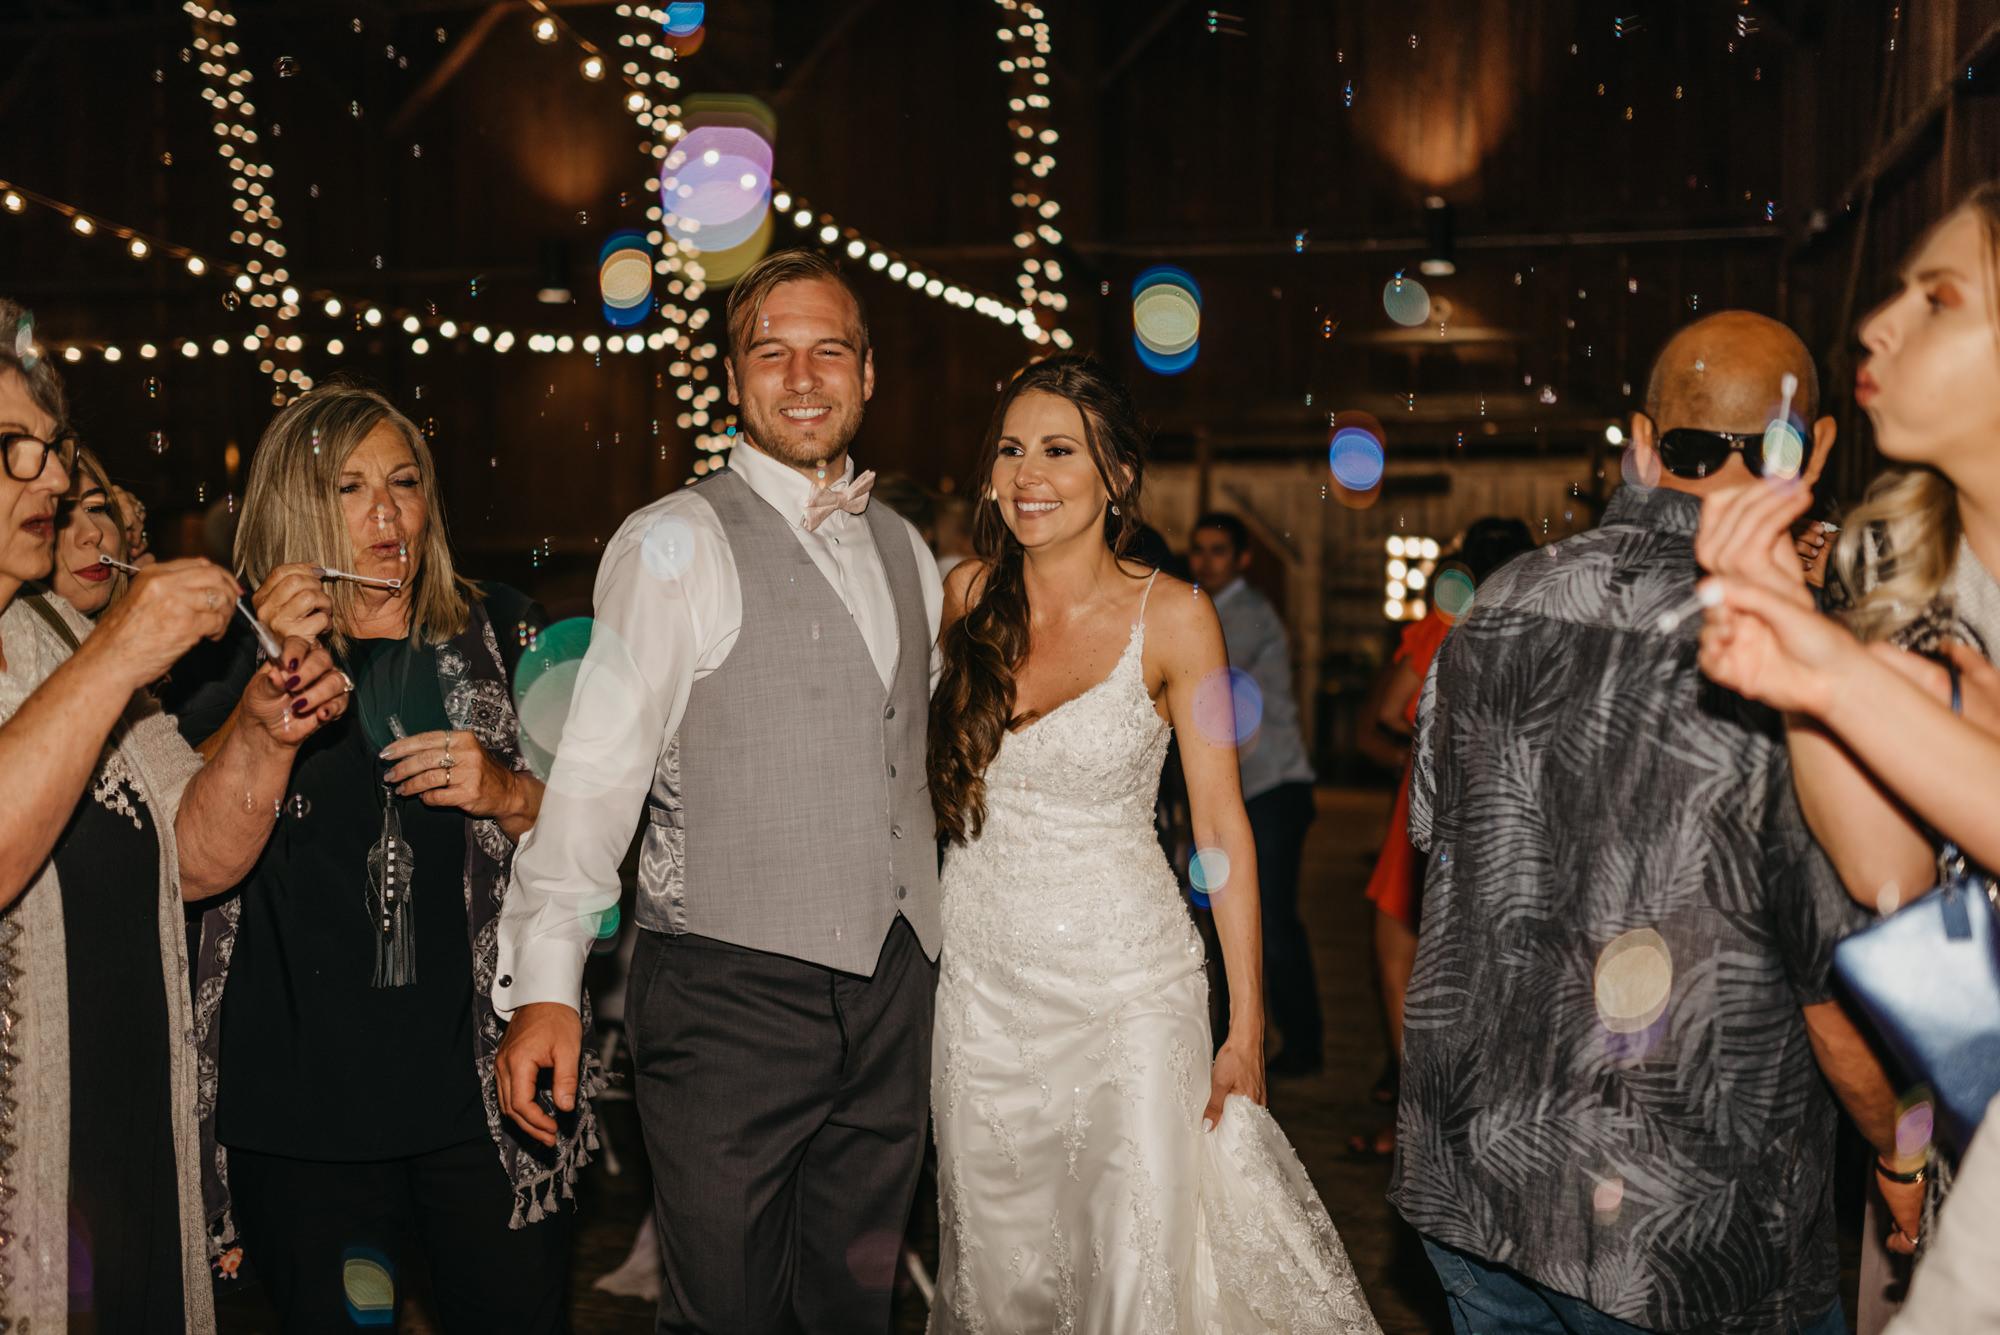 222-portland-northwest-wedding-bubble-exit-barn-string-lights.jpg